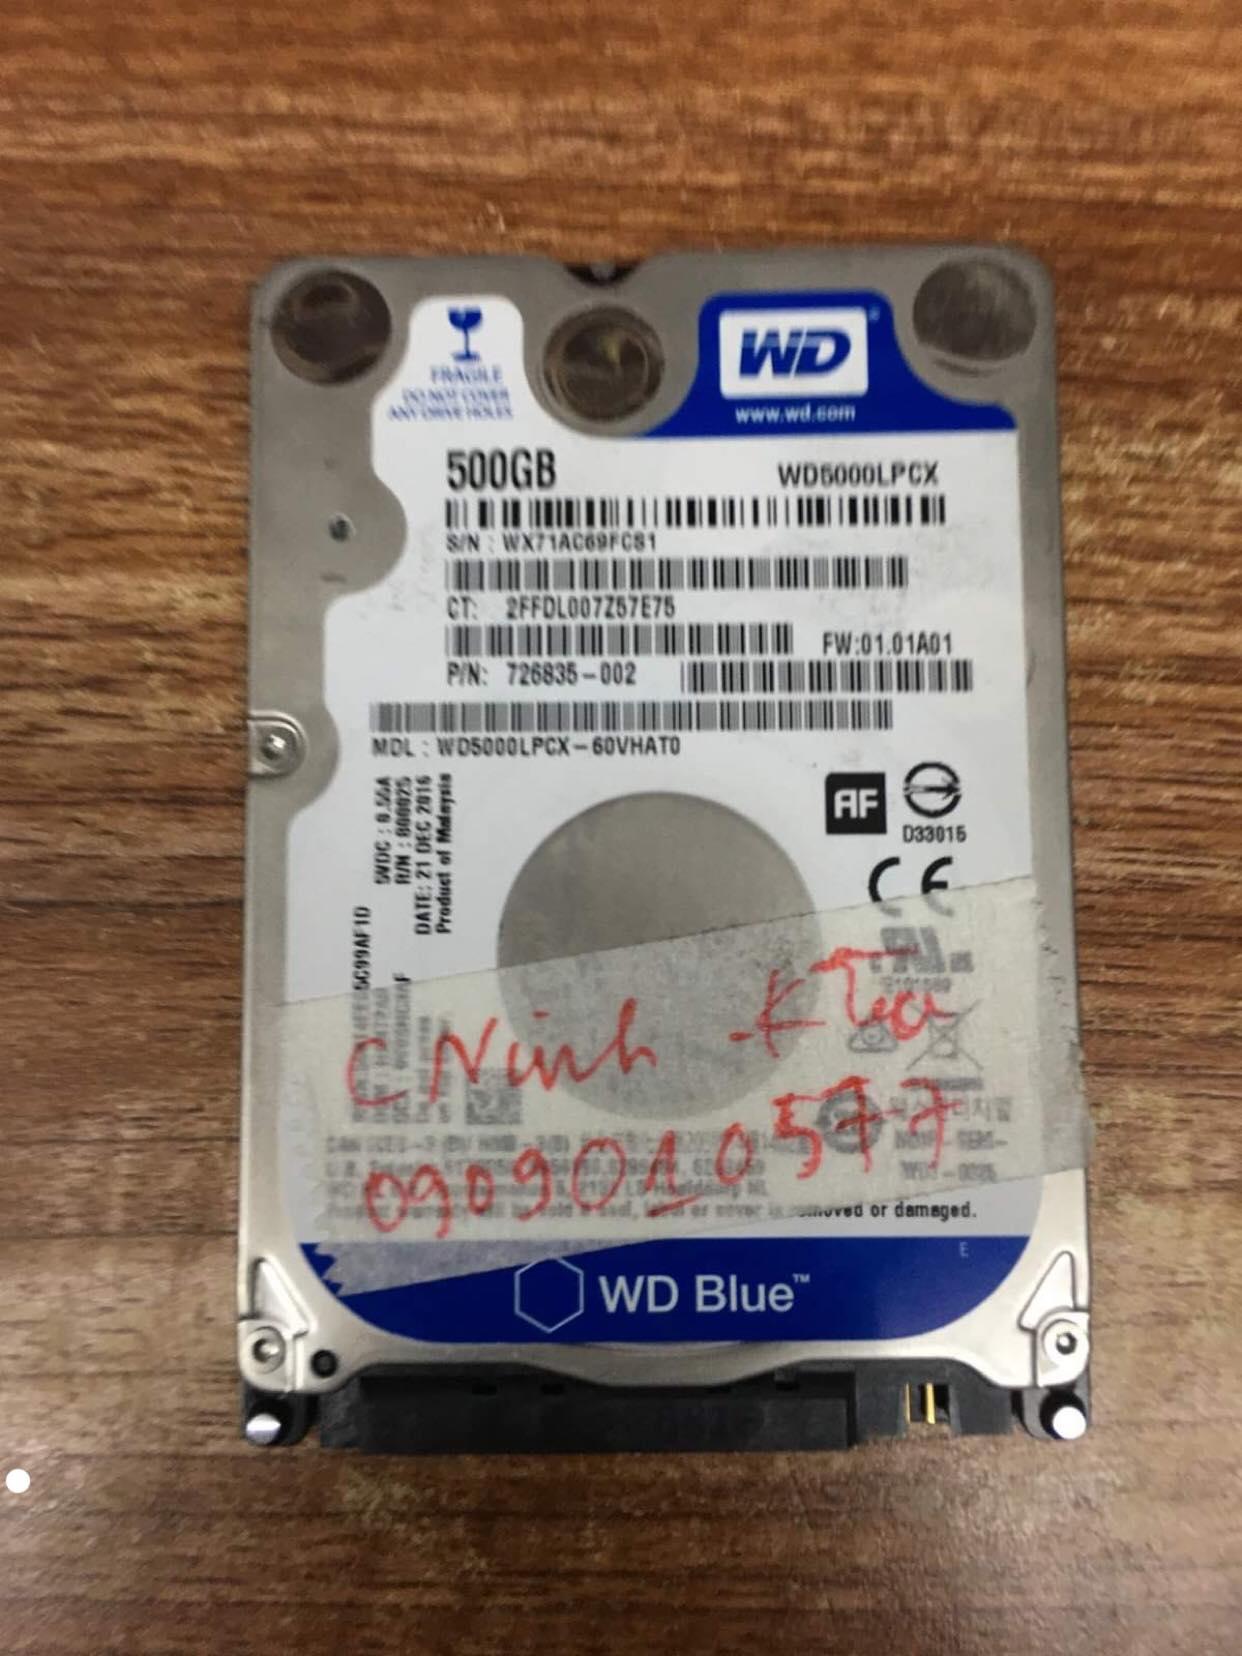 Cứu dữ liệu ổ cứng Western 500GB xóa nhầm 04/12/2019 - cuumaytinh